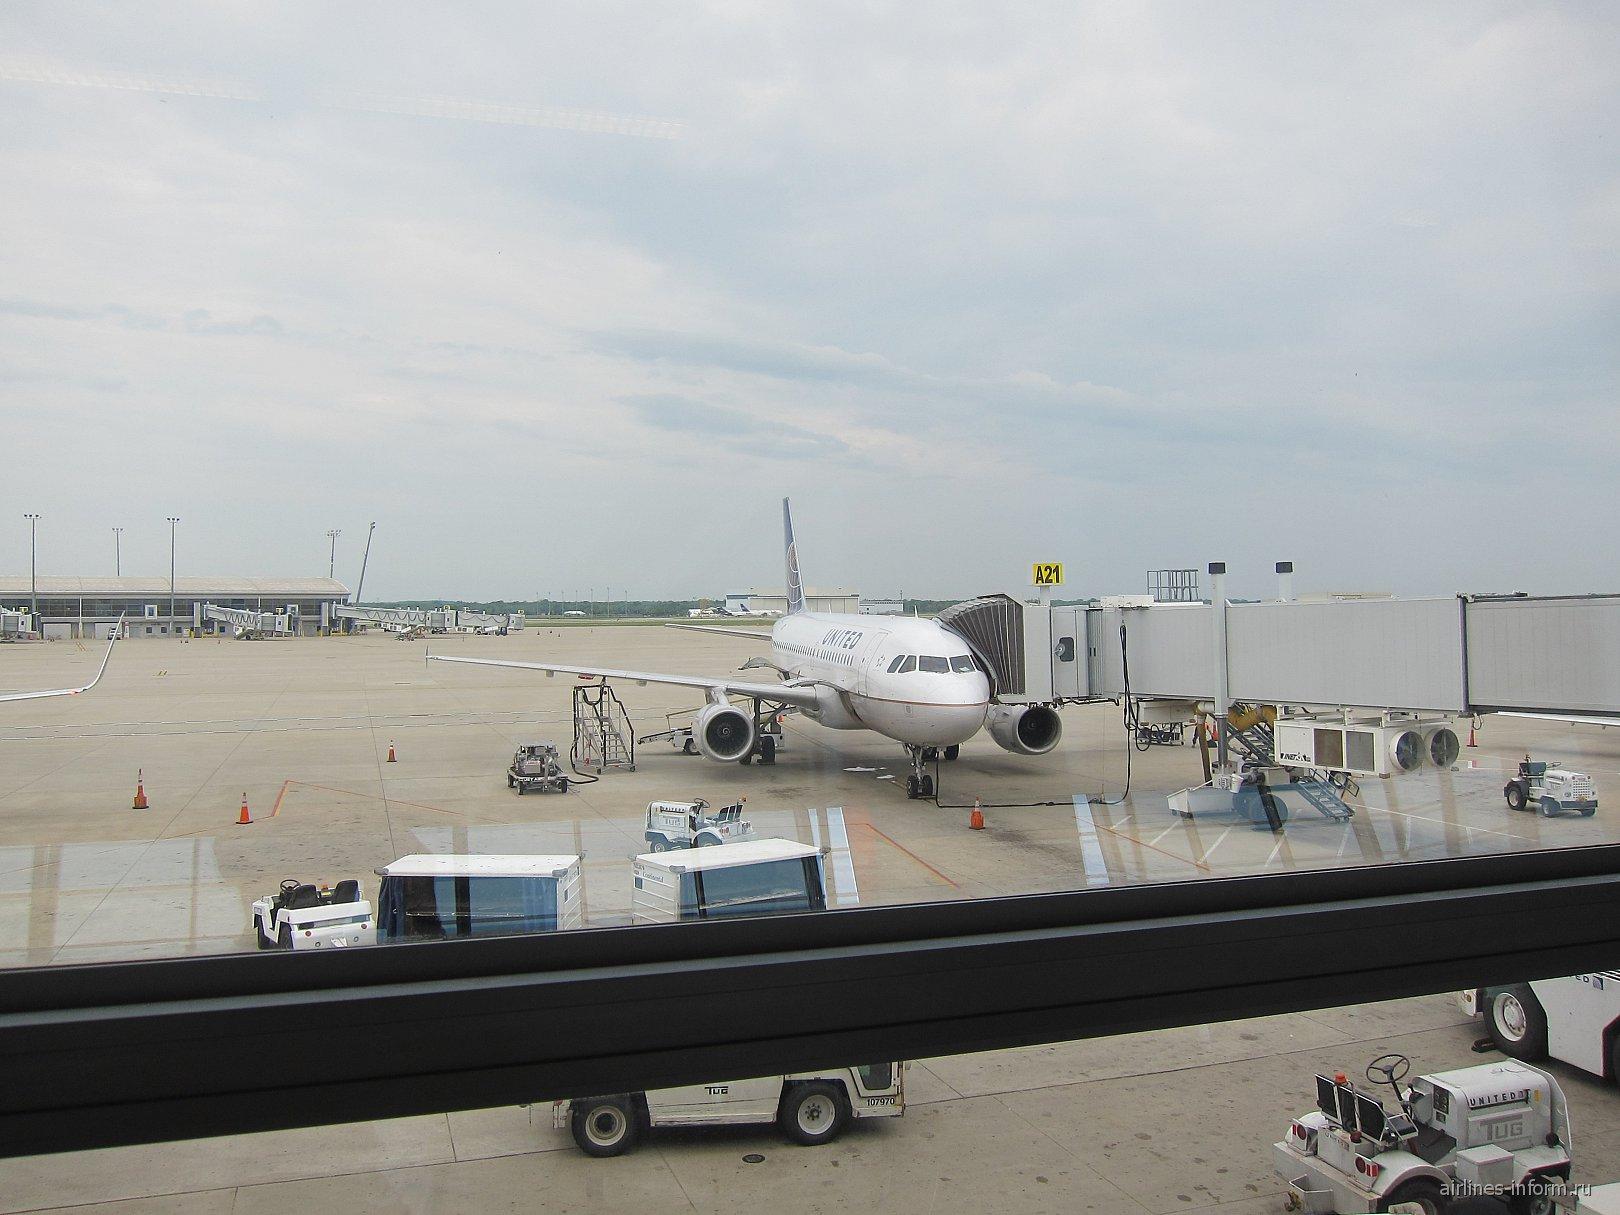 Airbus A319 авиакомпании United в аэропорту Индианаполиса